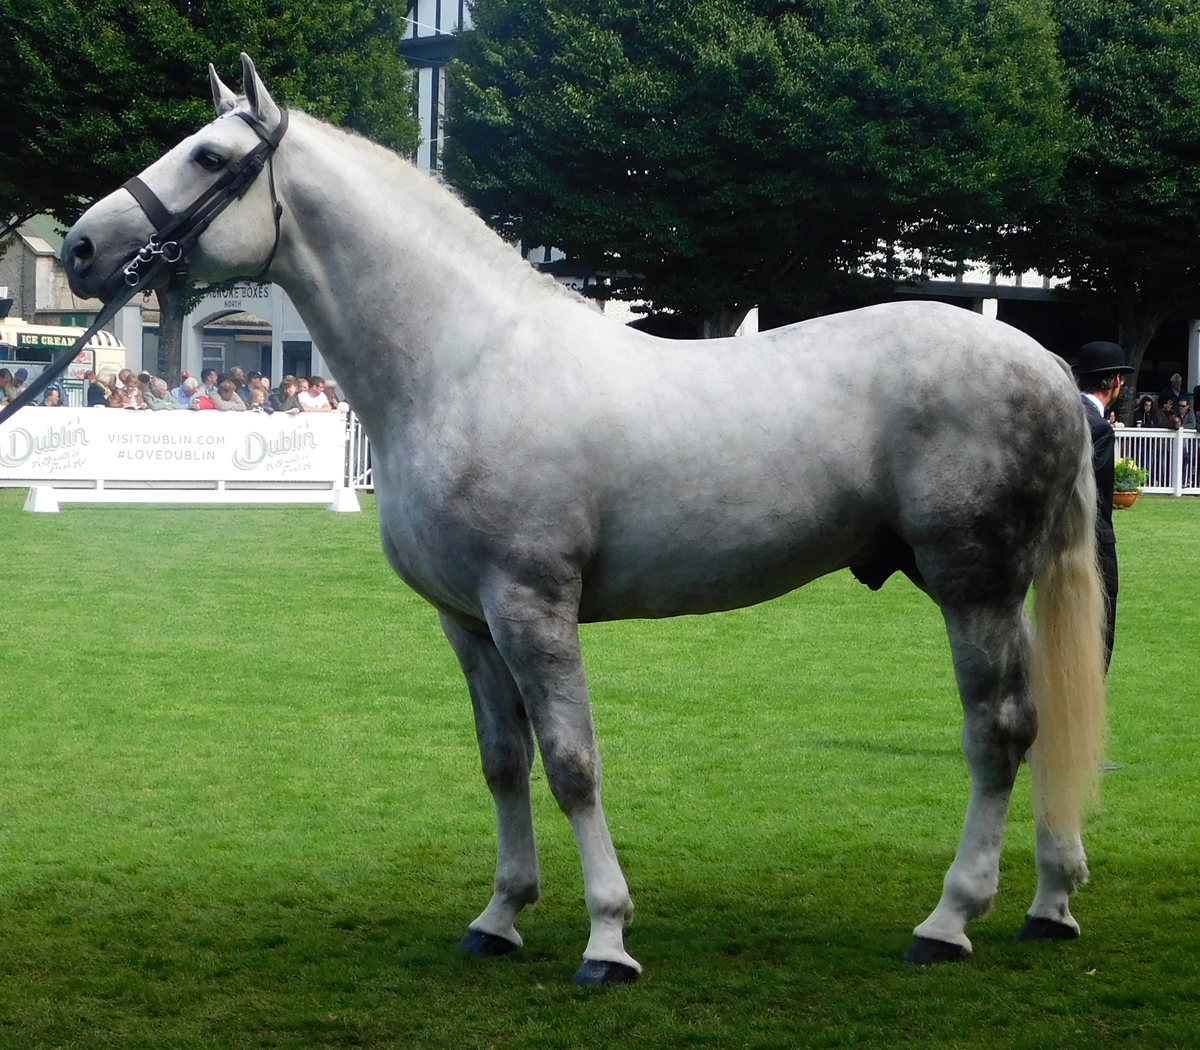 Irish Draught Wikipedia Irish Sport Horse Draft Horse Breeds Horse Breeds [ 1050 x 1200 Pixel ]